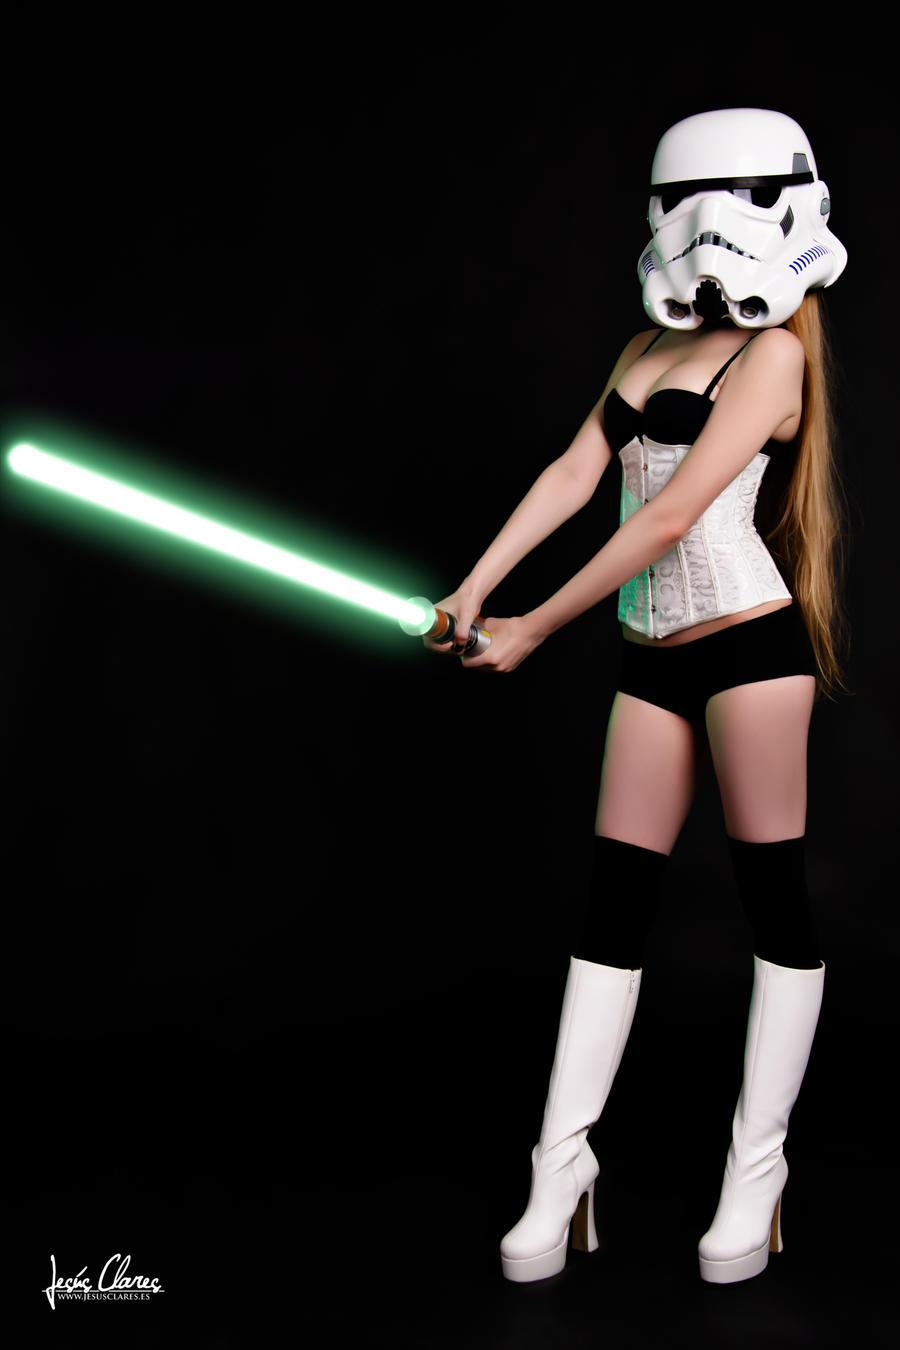 Sexy StarWars Stormtrooper by Hekady